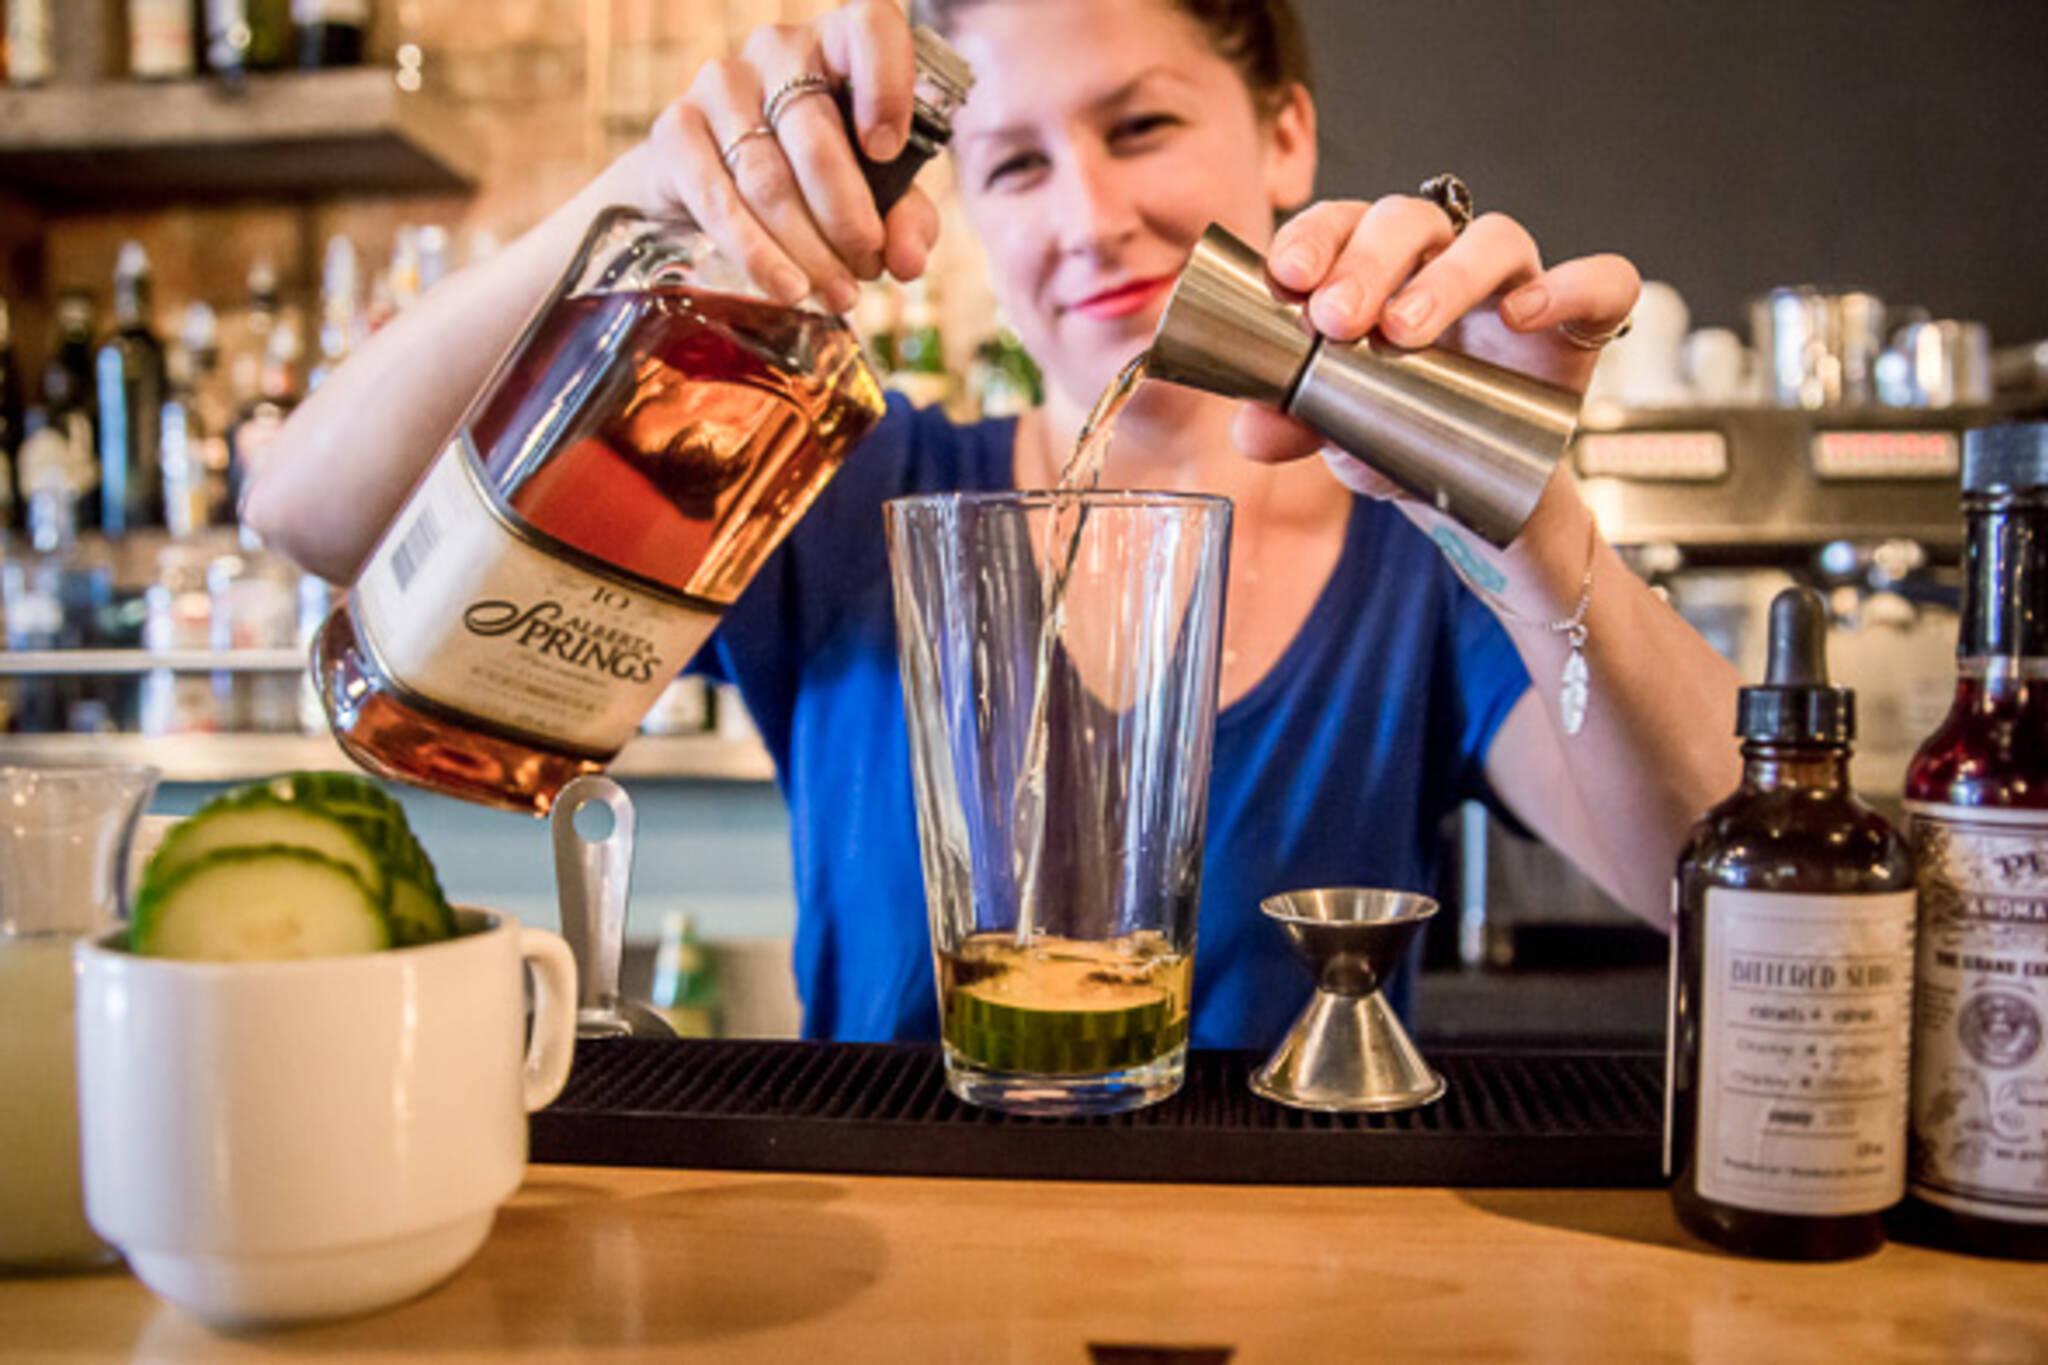 Margueretta Cup cocktail